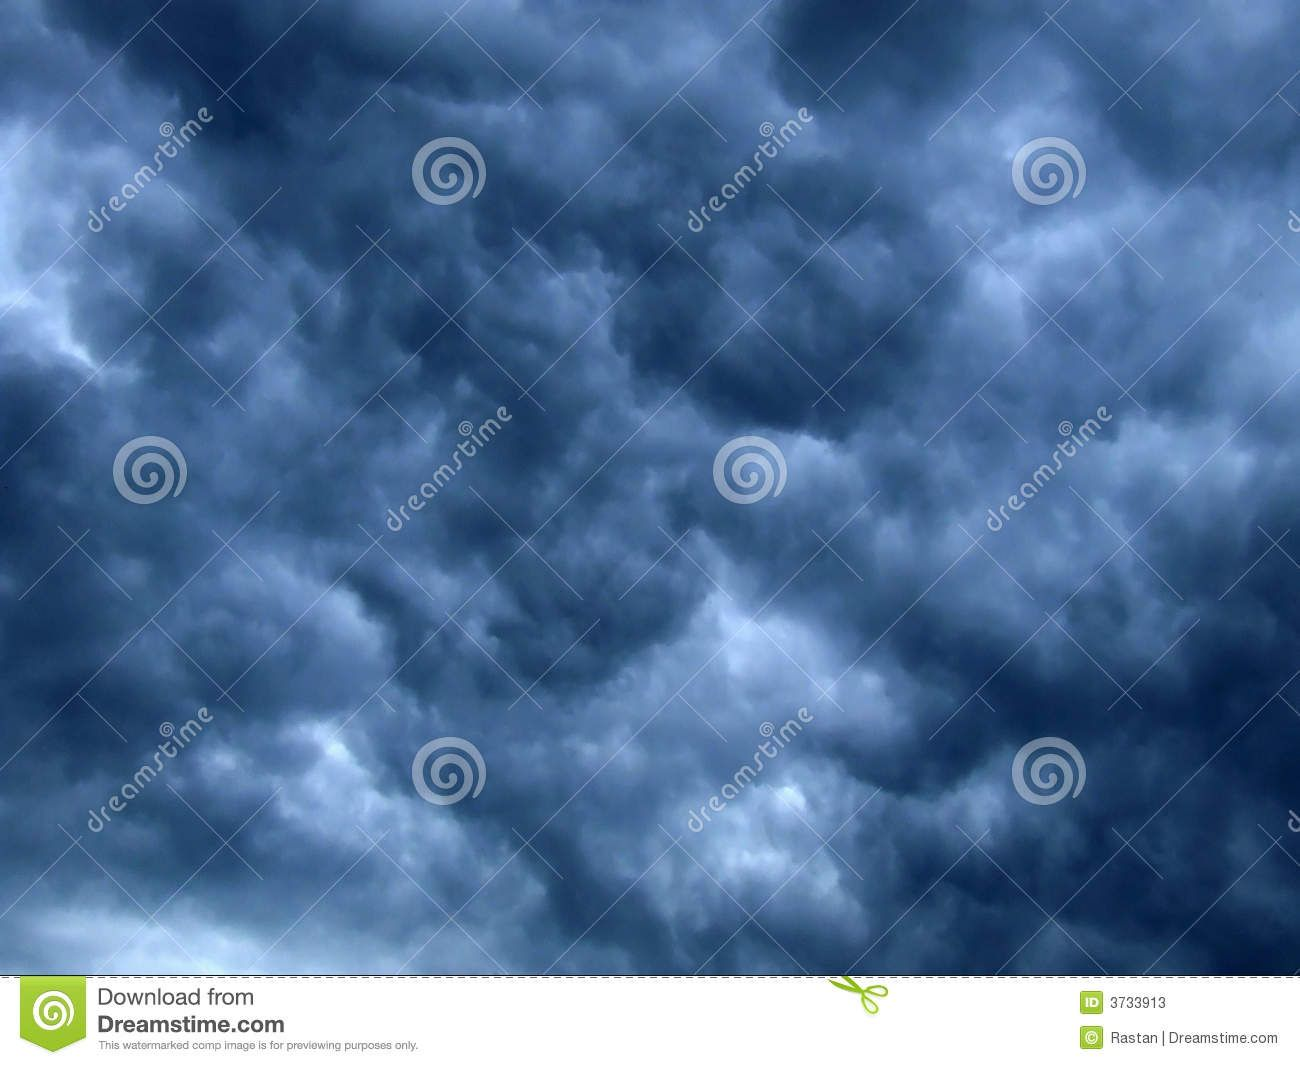 Sky Night Digital Art Clouds 1920x1200 Wallpaper 4761vv Wallhaven Cc Widescreen Wallpaper Hd Wallpaper Clouds